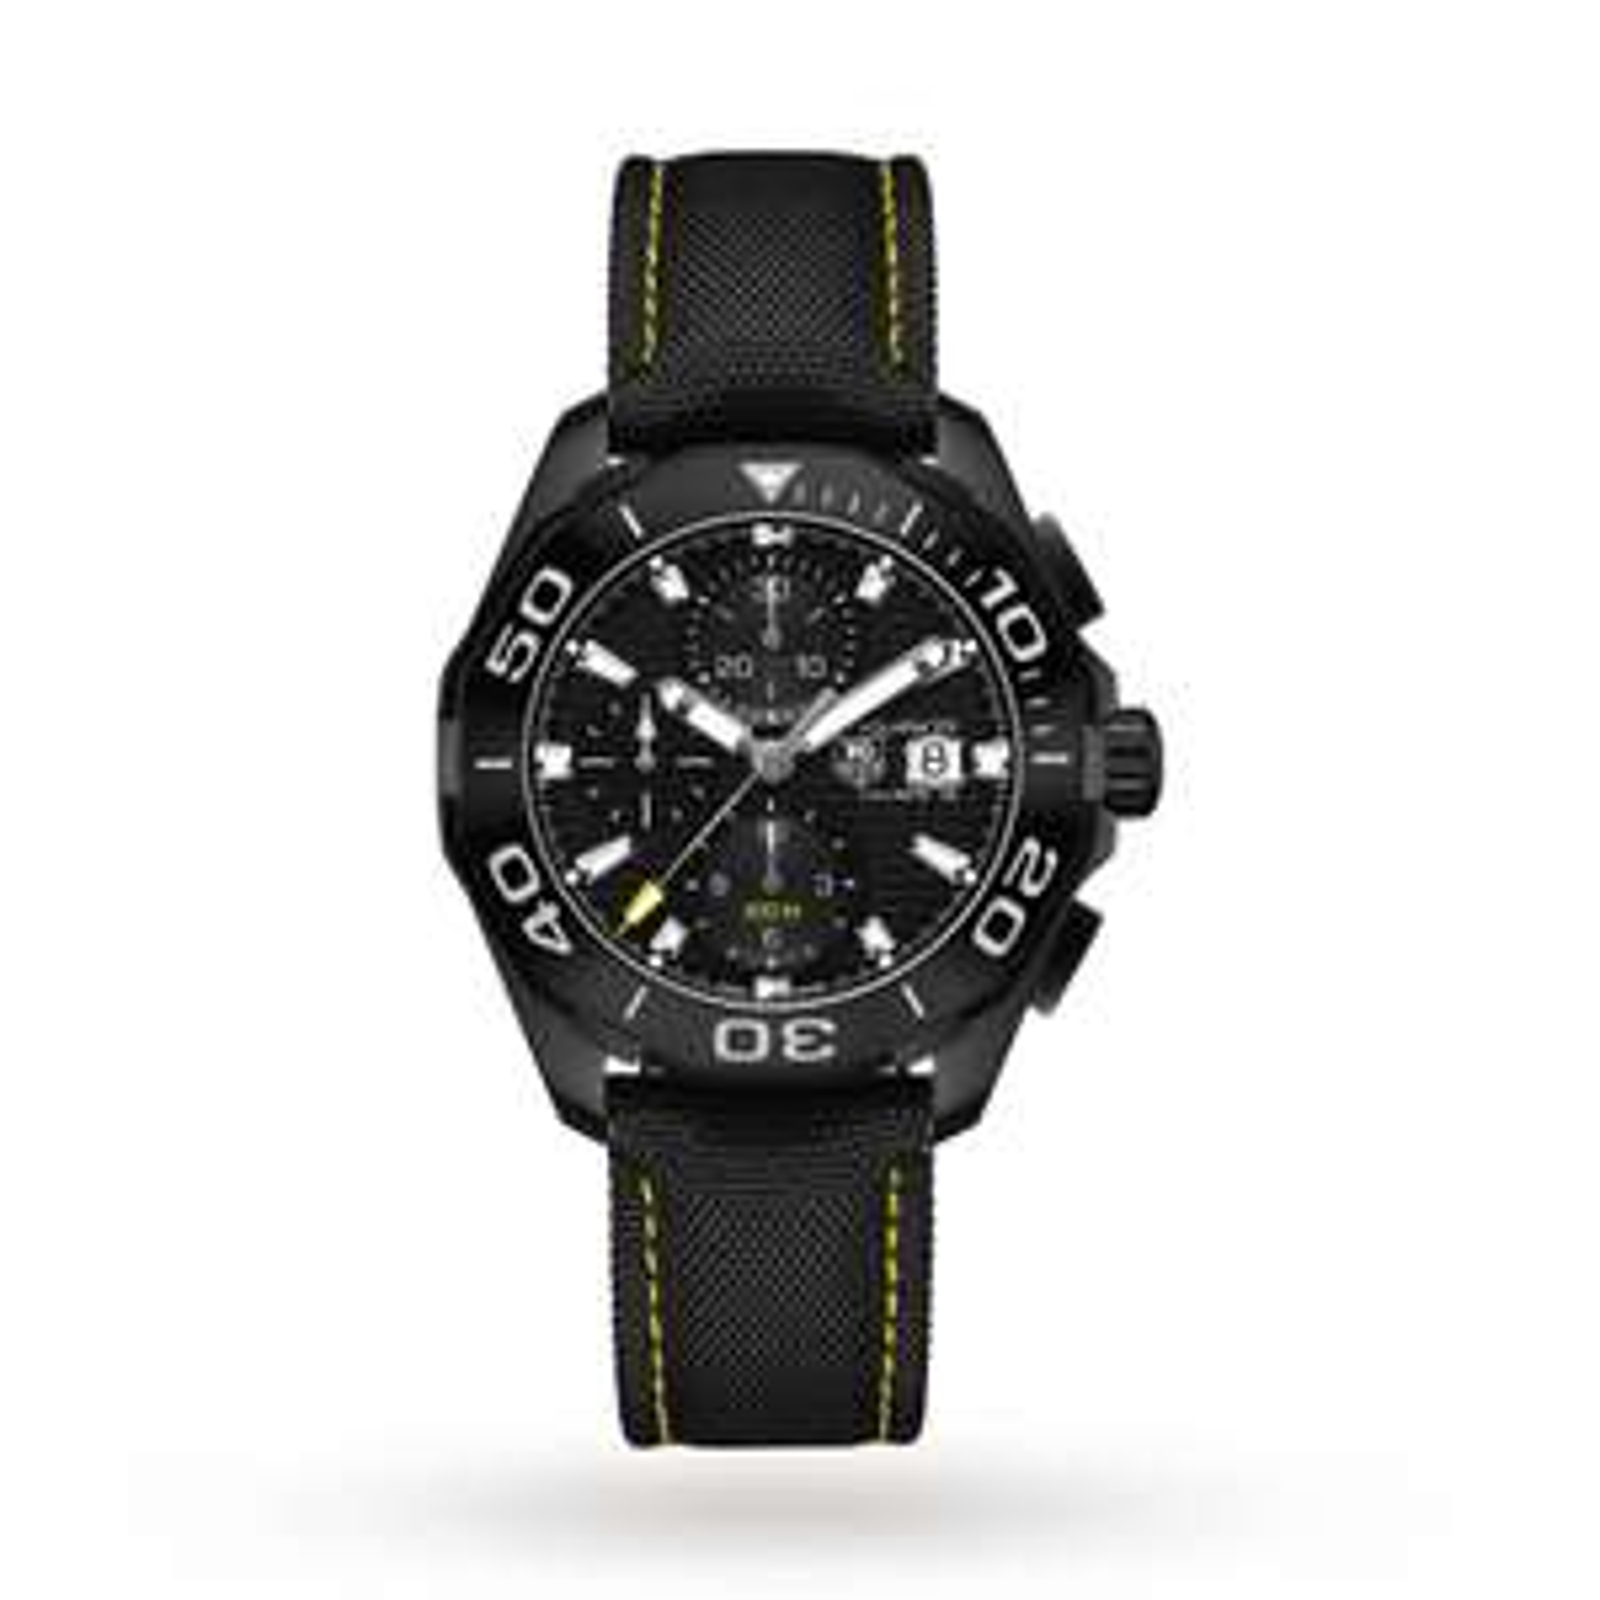 TAG Heuer Aquaracer Calibre 16 Mens Watch £2150 Delivered @ Goldsmiths